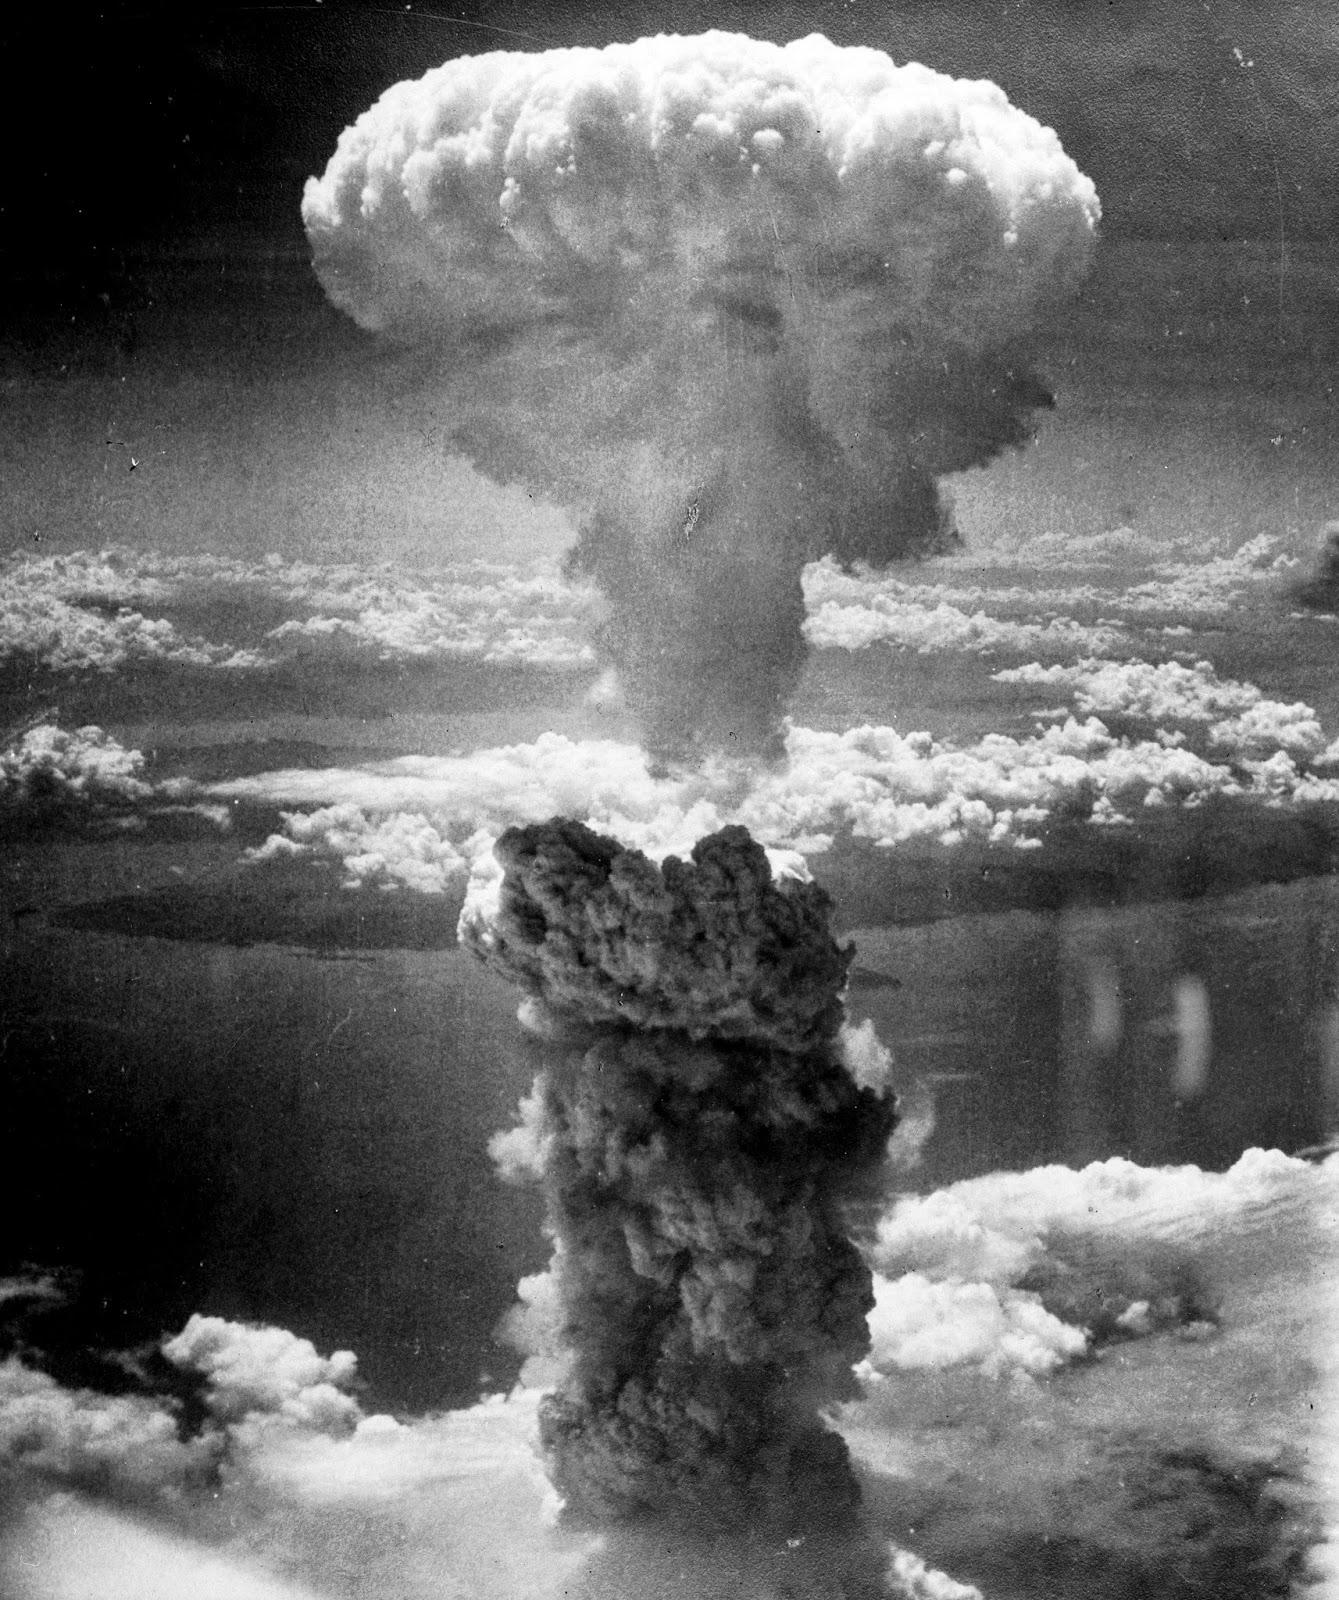 http://upload.wikimedia.org/wikipedia/commons/e/e0/Nagasakibomb.jpg